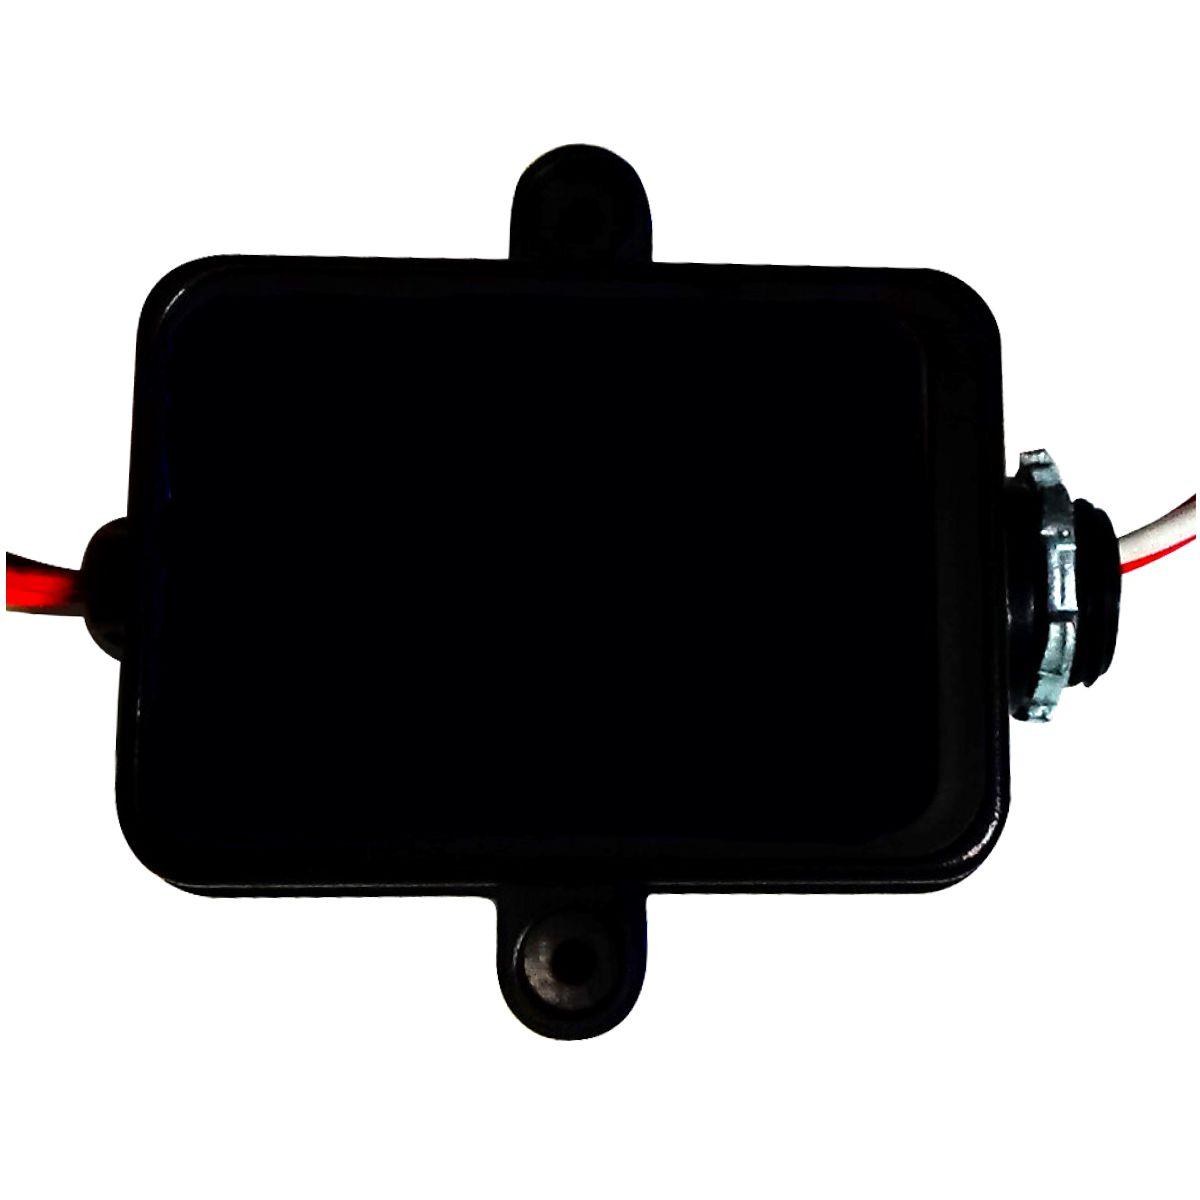 Occupancy Vacancy Sensors Lighting Controls Override Light Sensor Wiring Diagram Mpshd